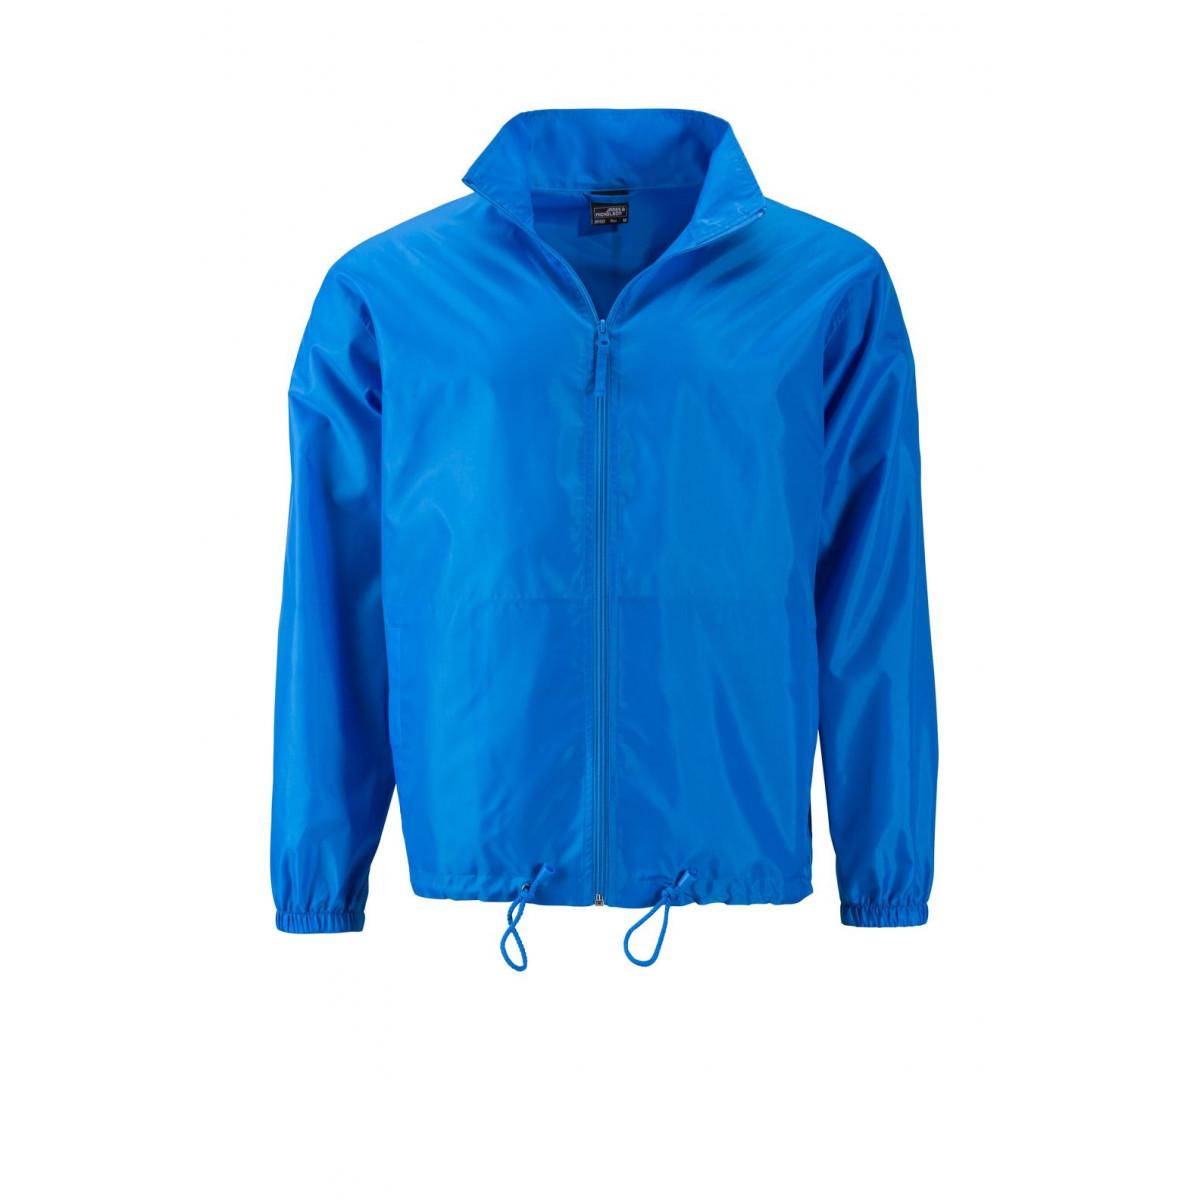 Куртка мужская JN1132 Mens Promo Jacket - Ярко-синий